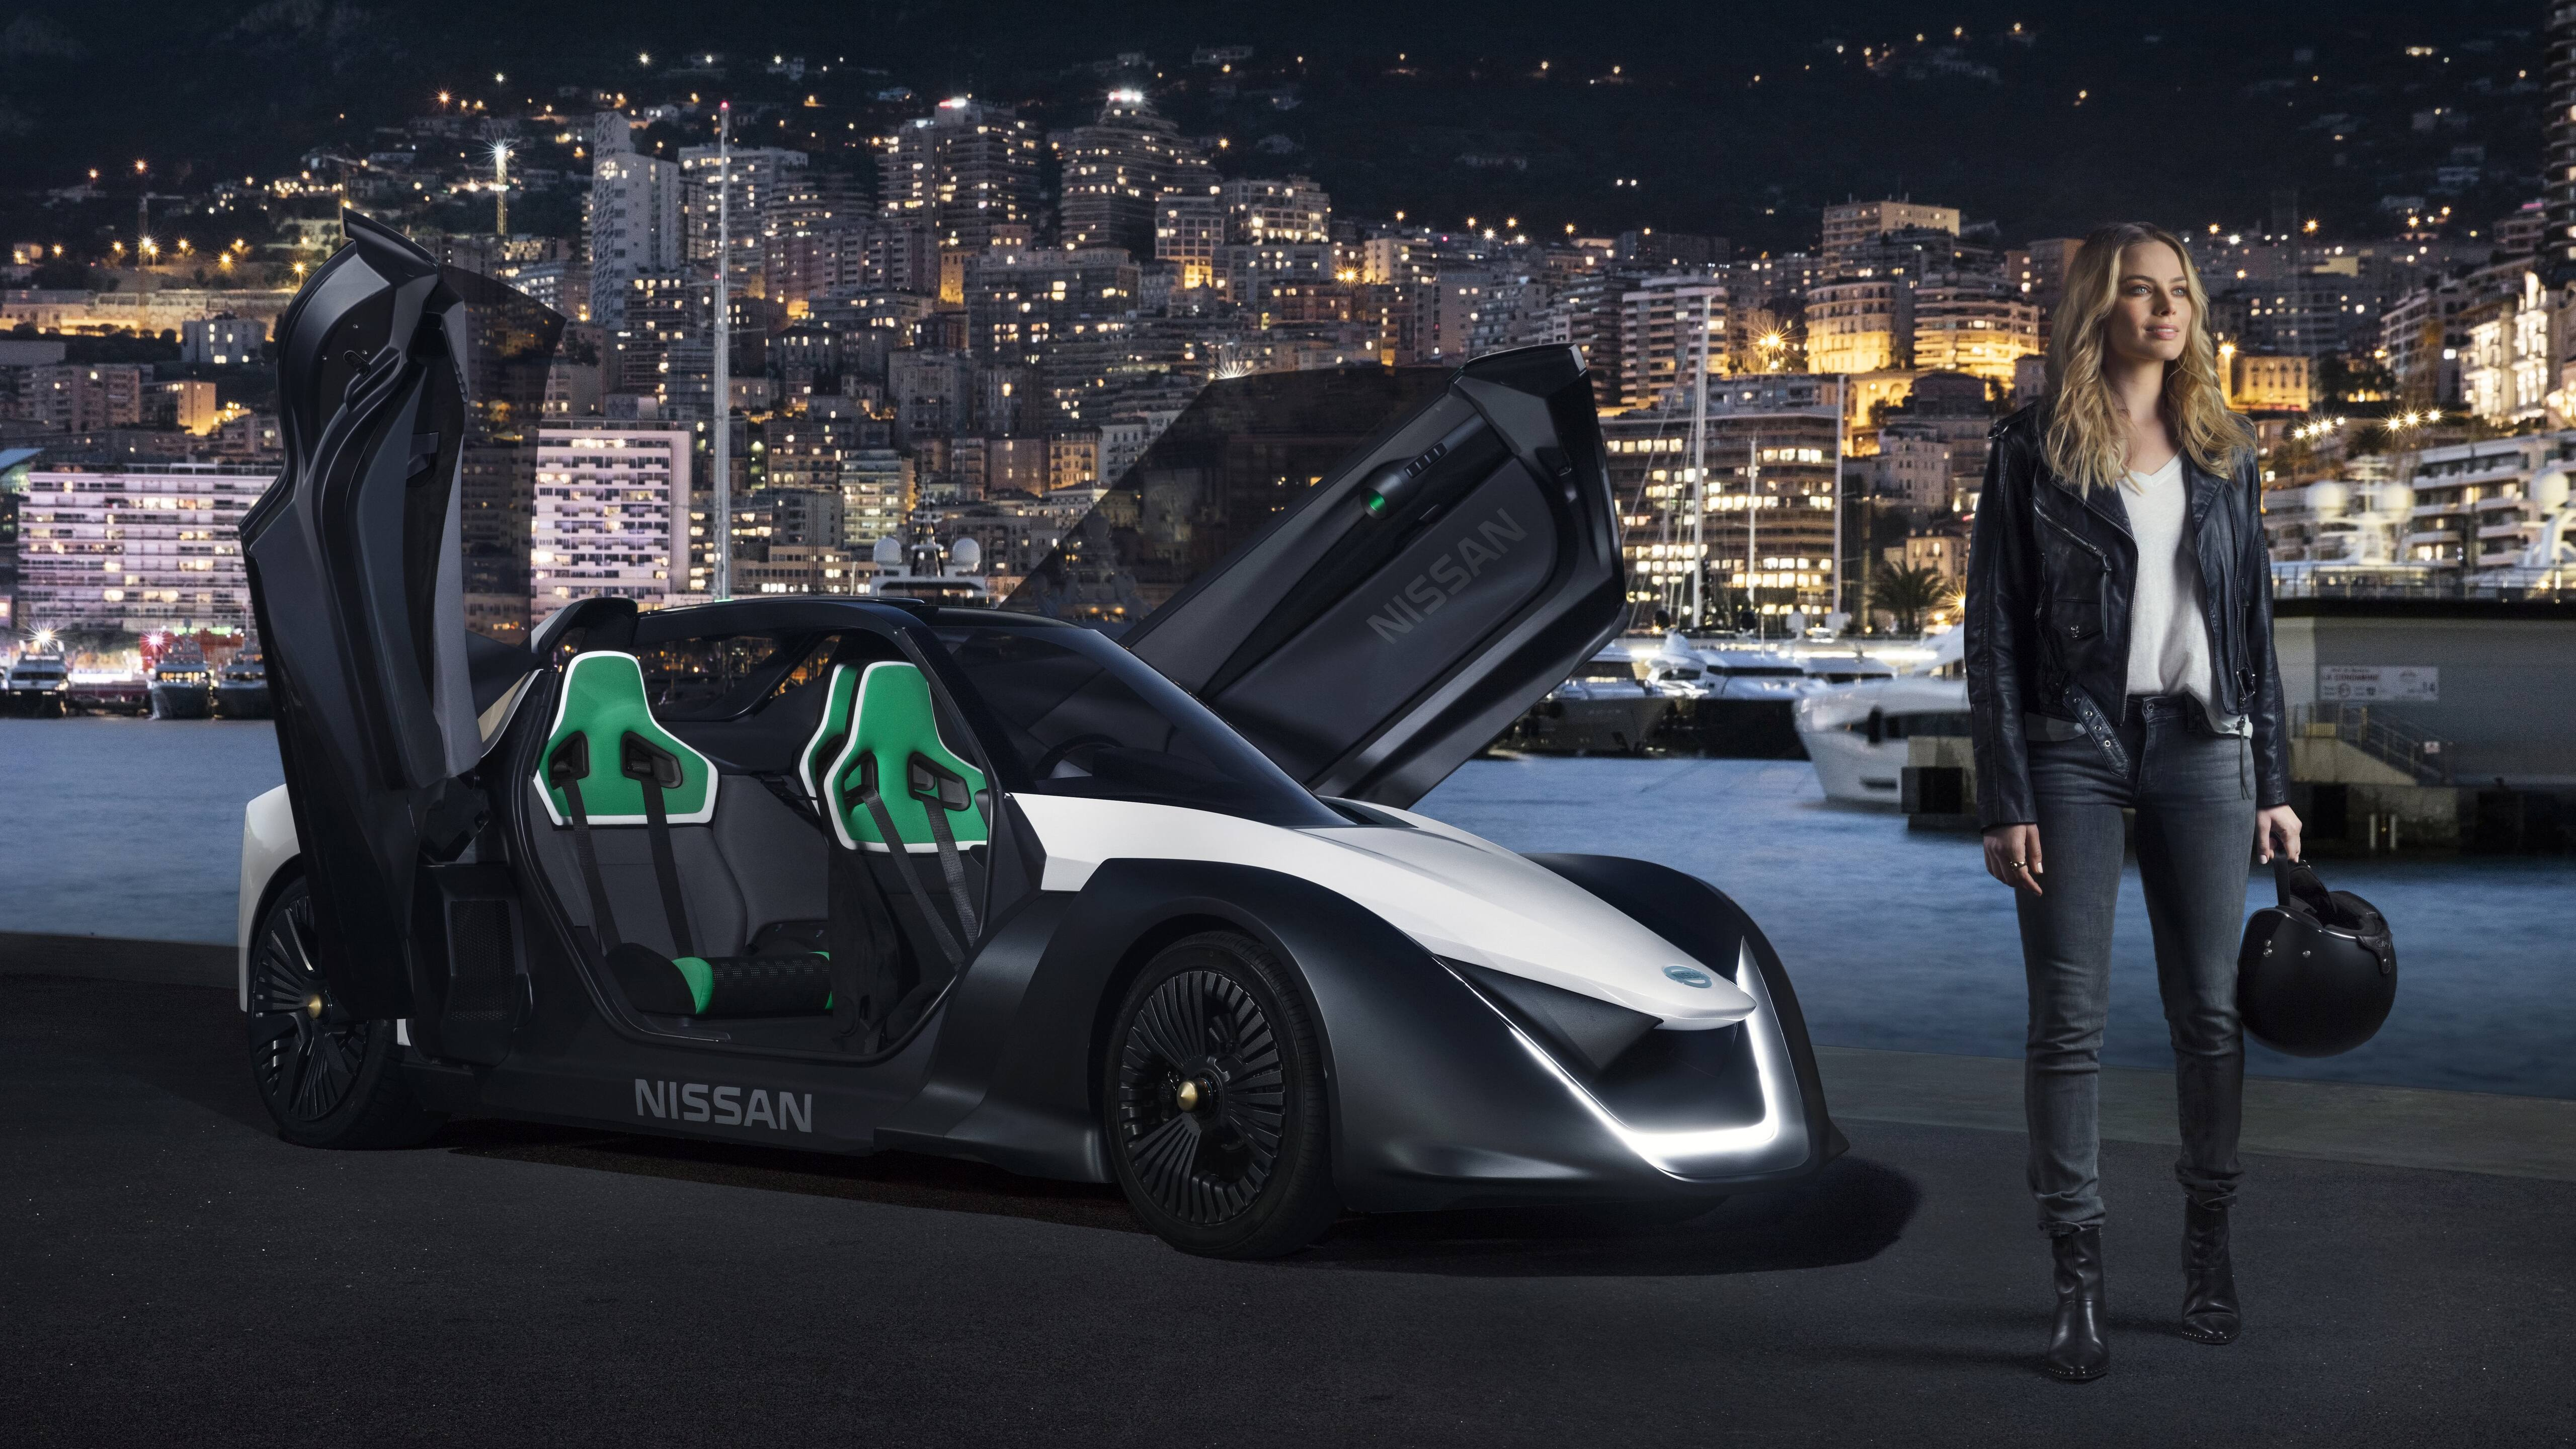 margot-robbie-nissan-electric-car-ambassador-8k-4k.jpg